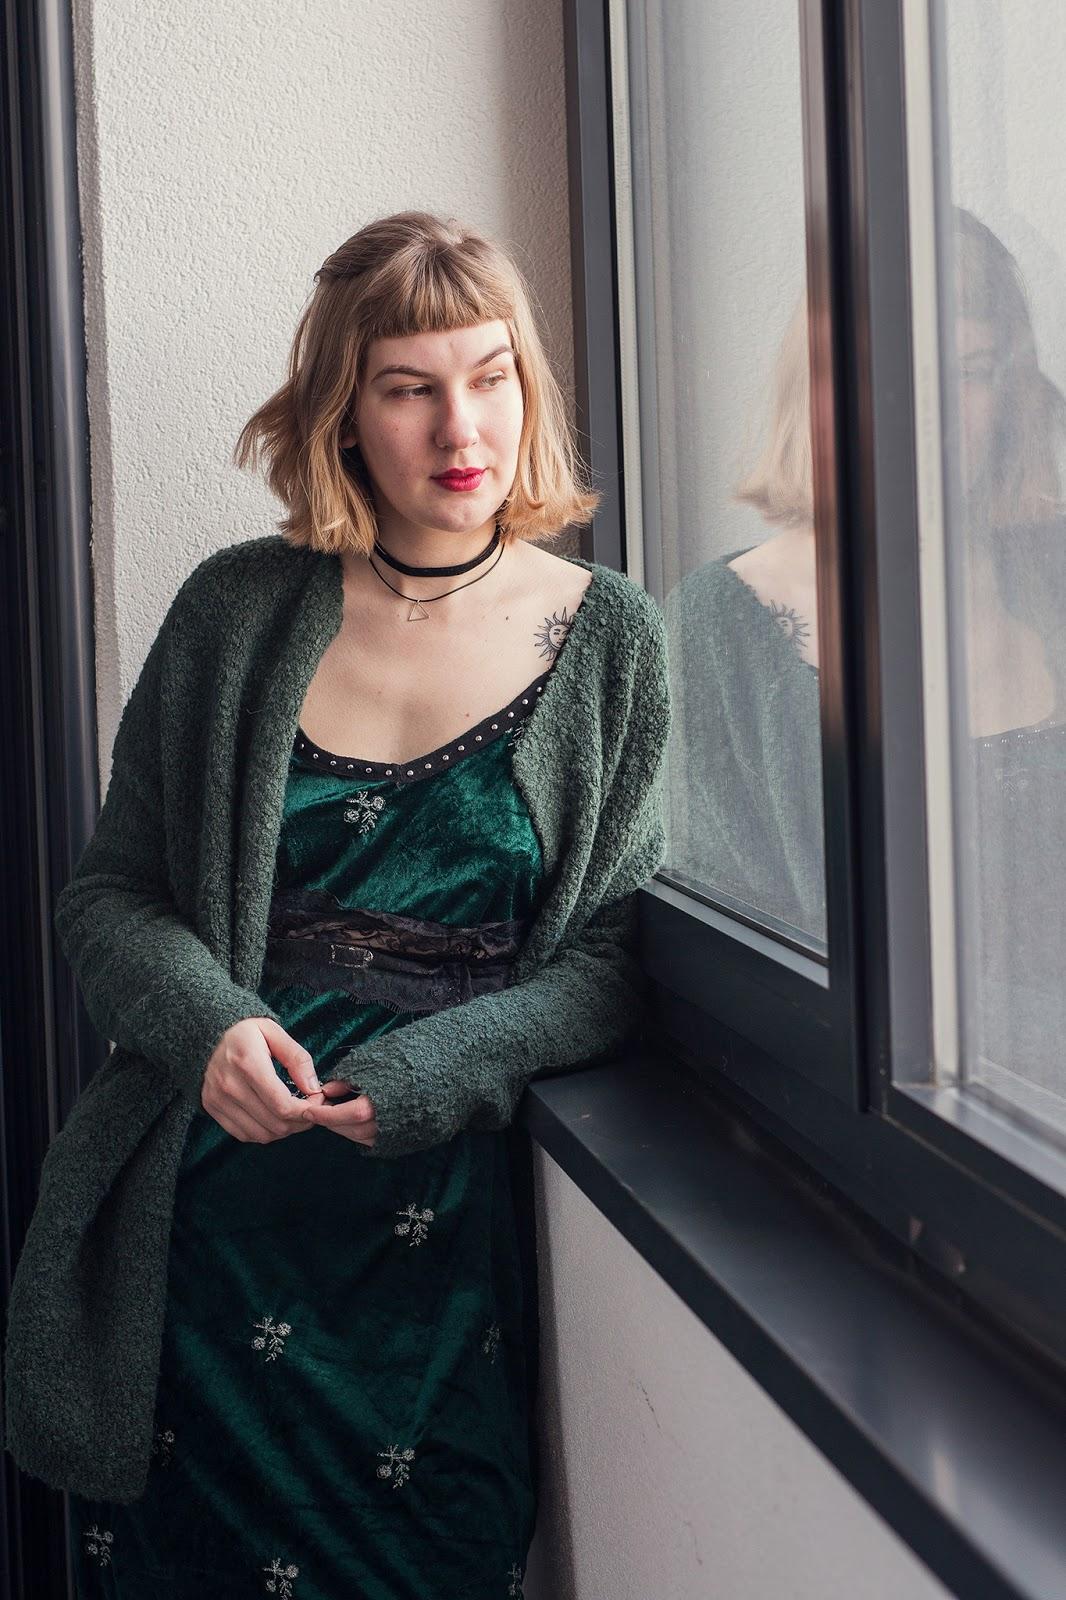 filipa canic, filipa canic blog, youarethepoet, you are the poet blog, haris rustemovic photography, zaful, green velvet dress,